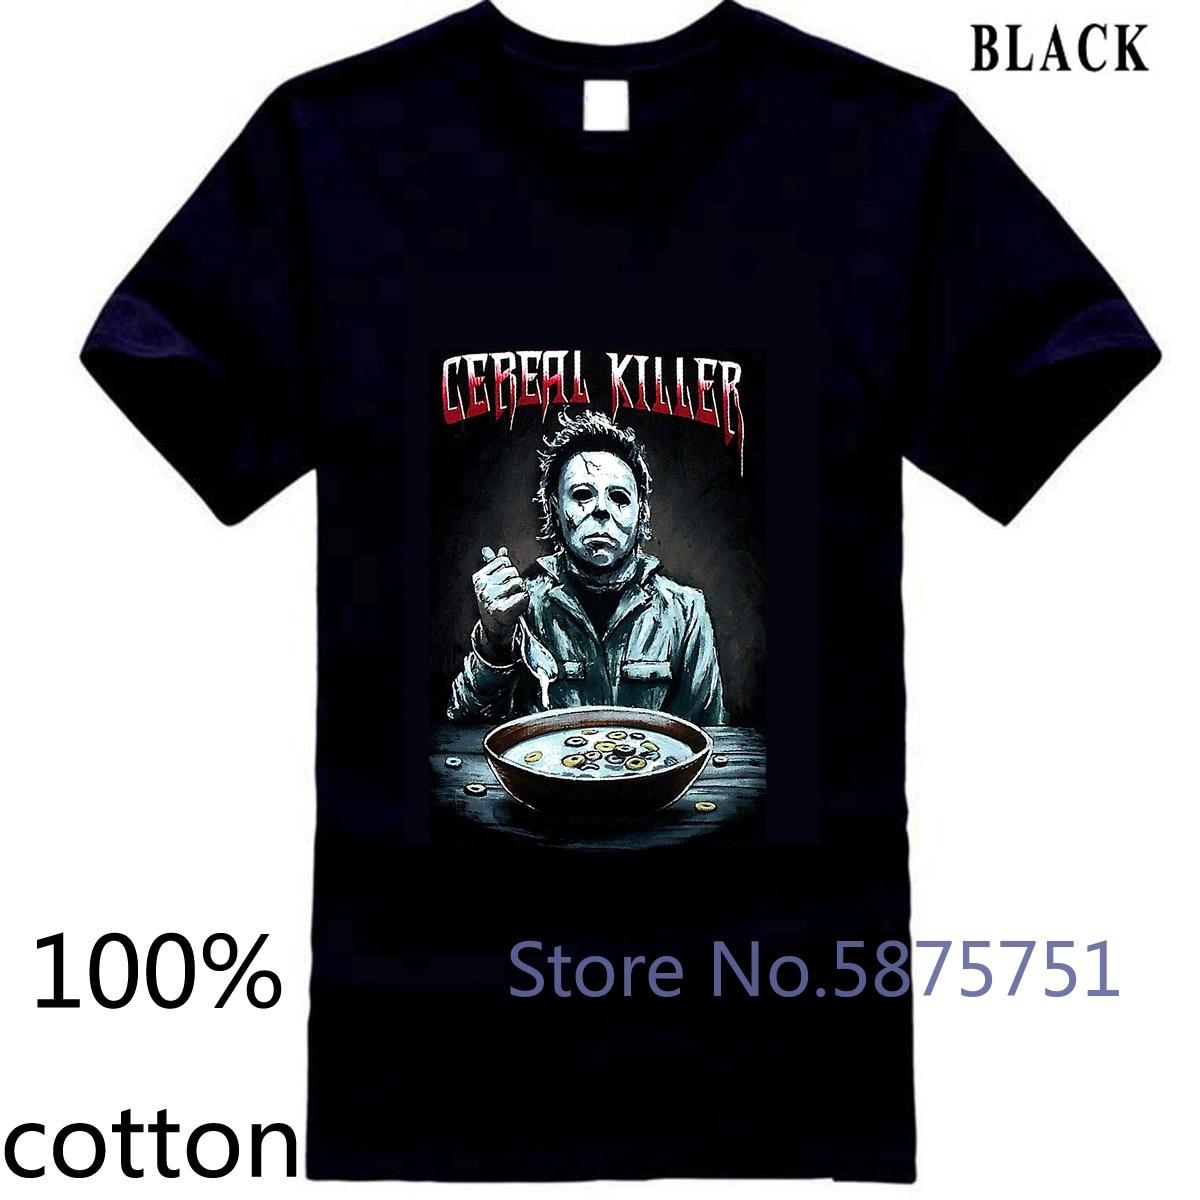 Halloween película Cereal Killer, Michael Myers, camiseta de hombre de estilo chino adulto camiseta tops camisetas hombre 100% de algodón